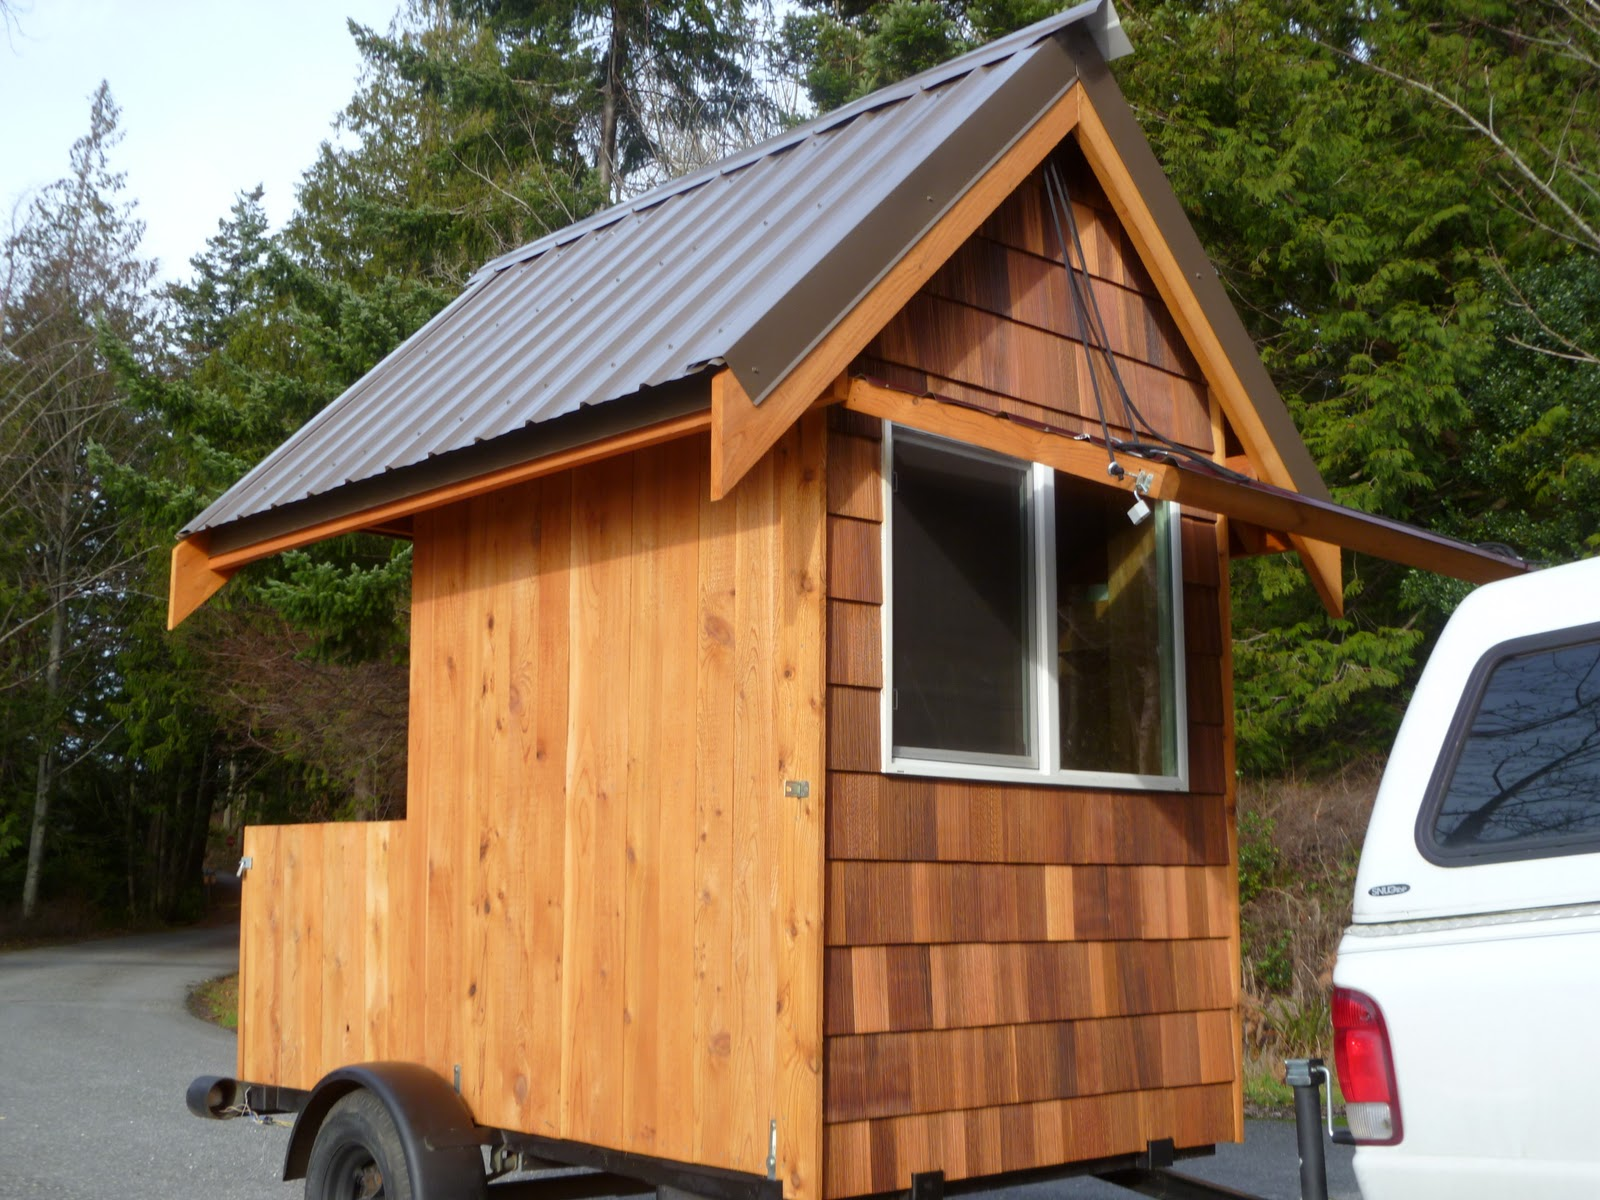 Relaxshackscom Eli Curtis Tiny Cabin On Wheels A micro getaway